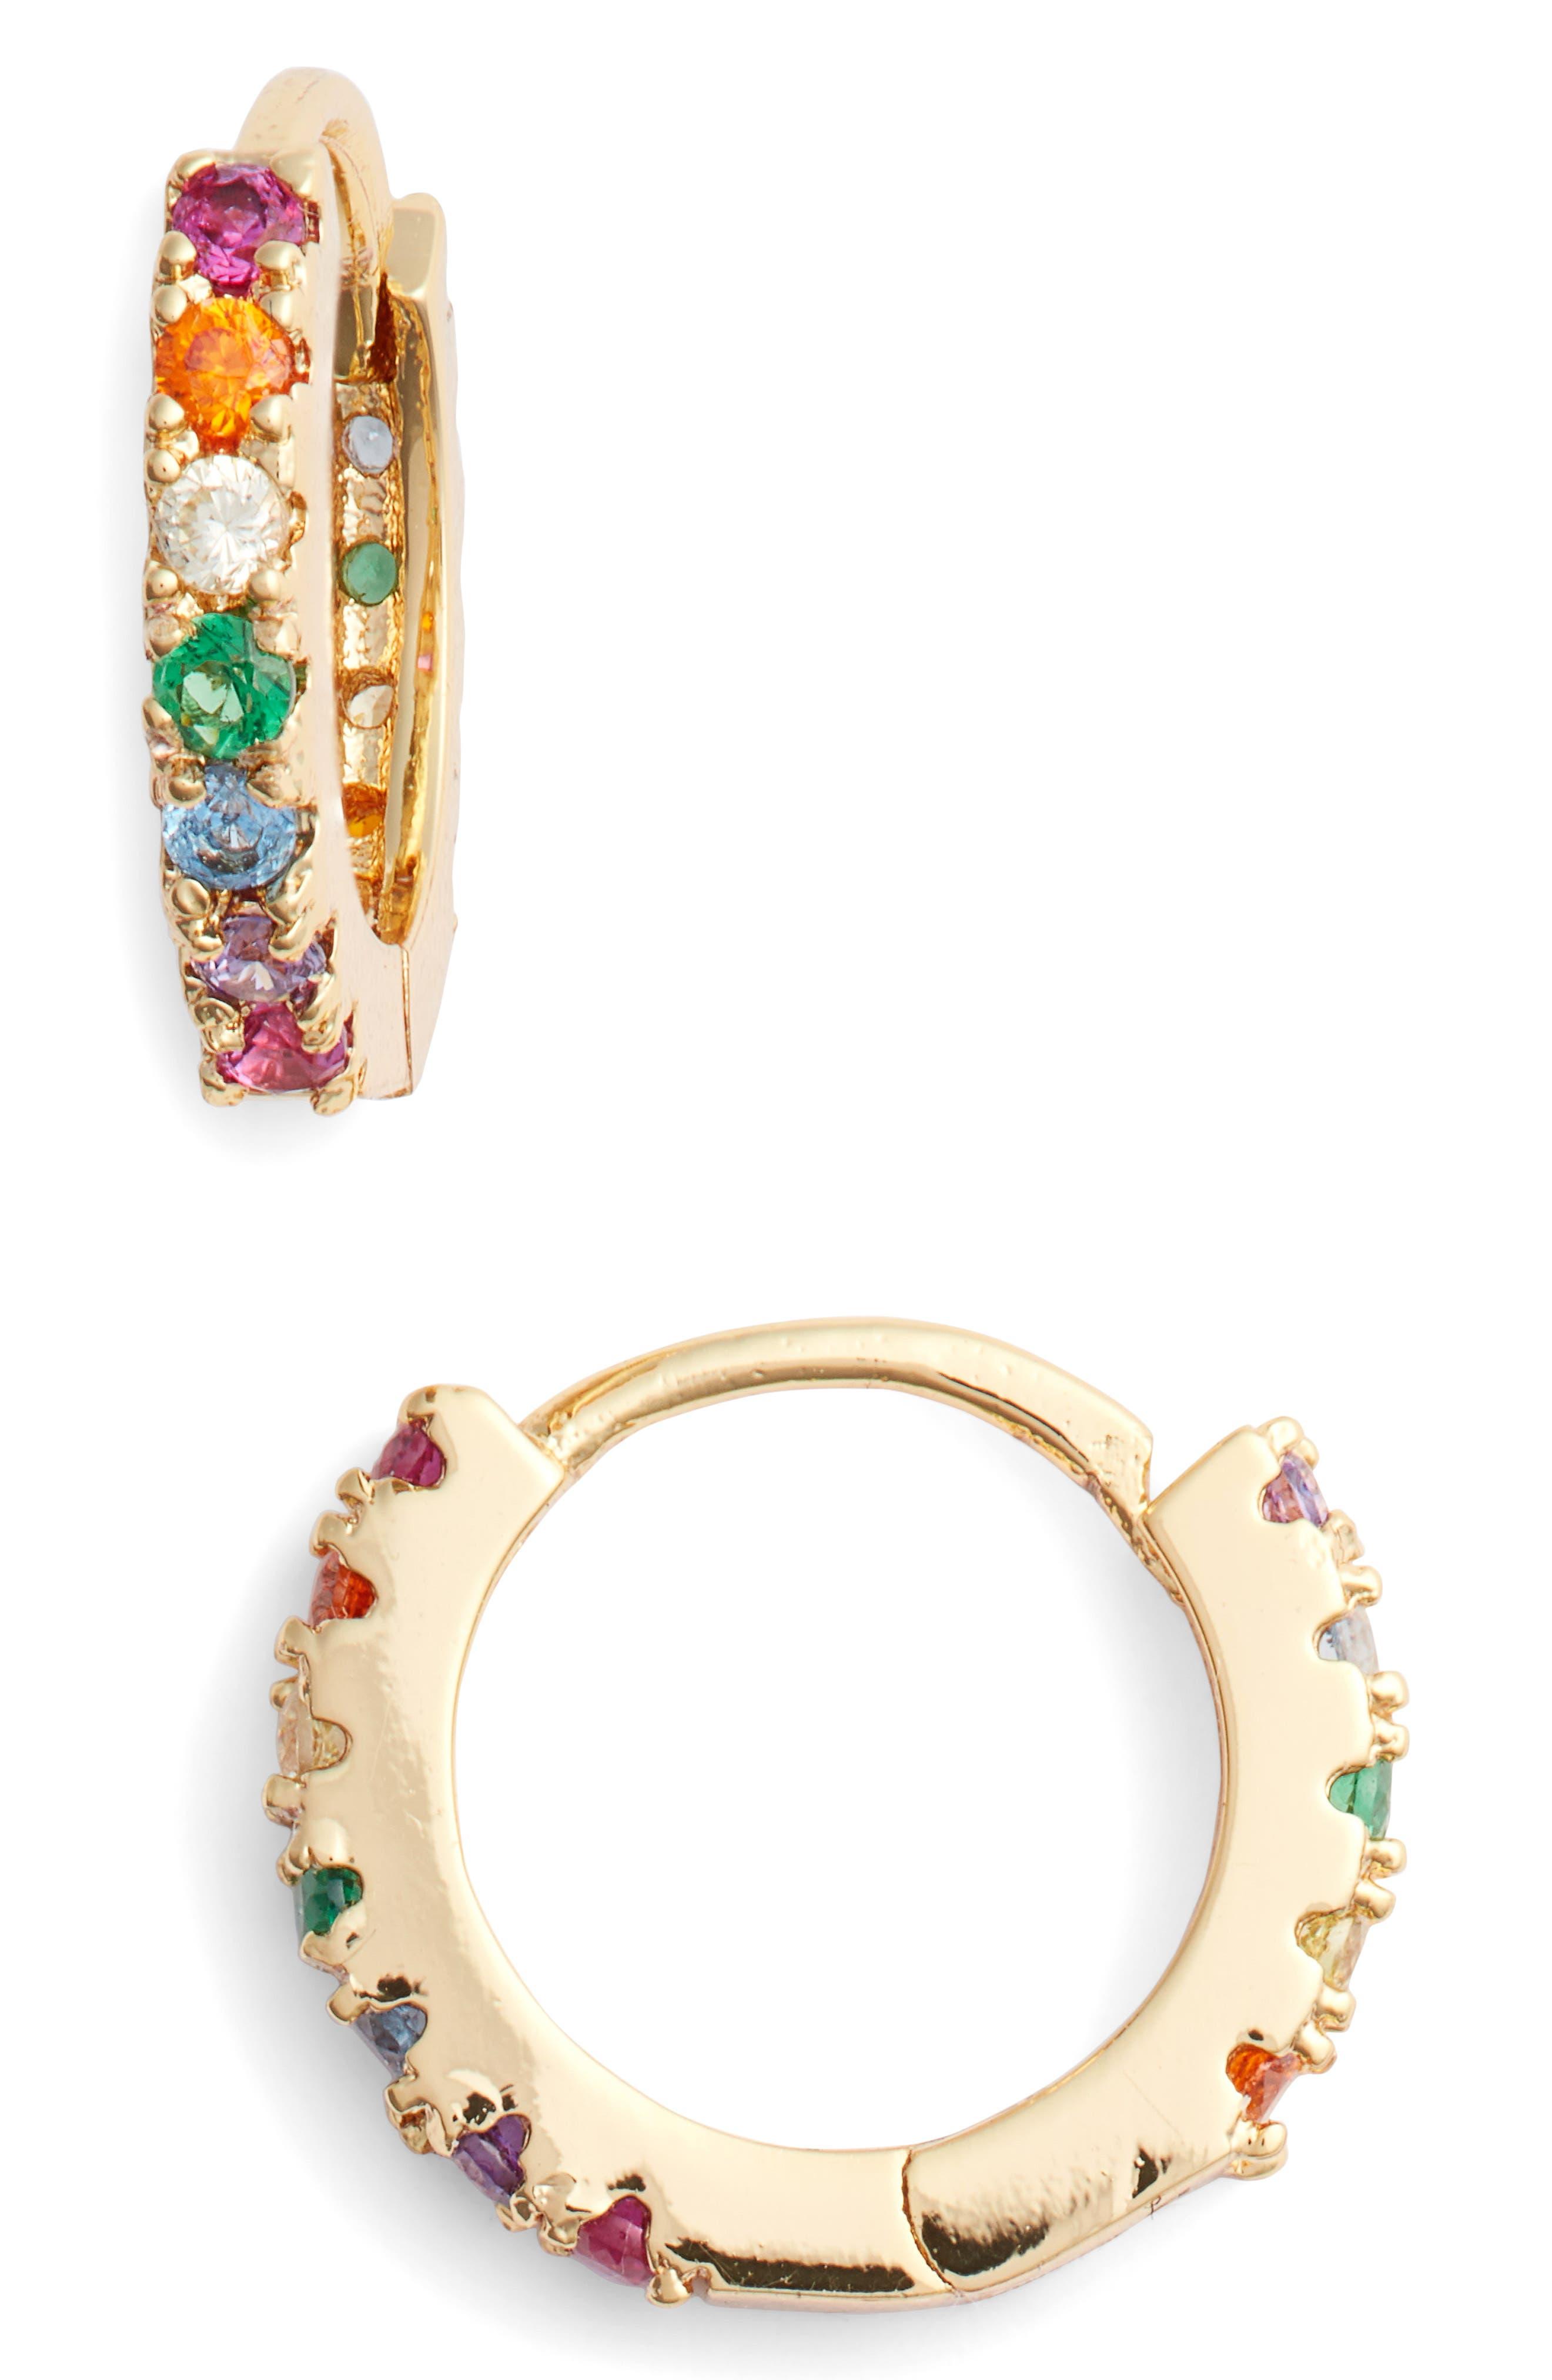 Rainbow Huggie Hoop Earrings,                             Main thumbnail 1, color,                             RAINBOW/ GOLD